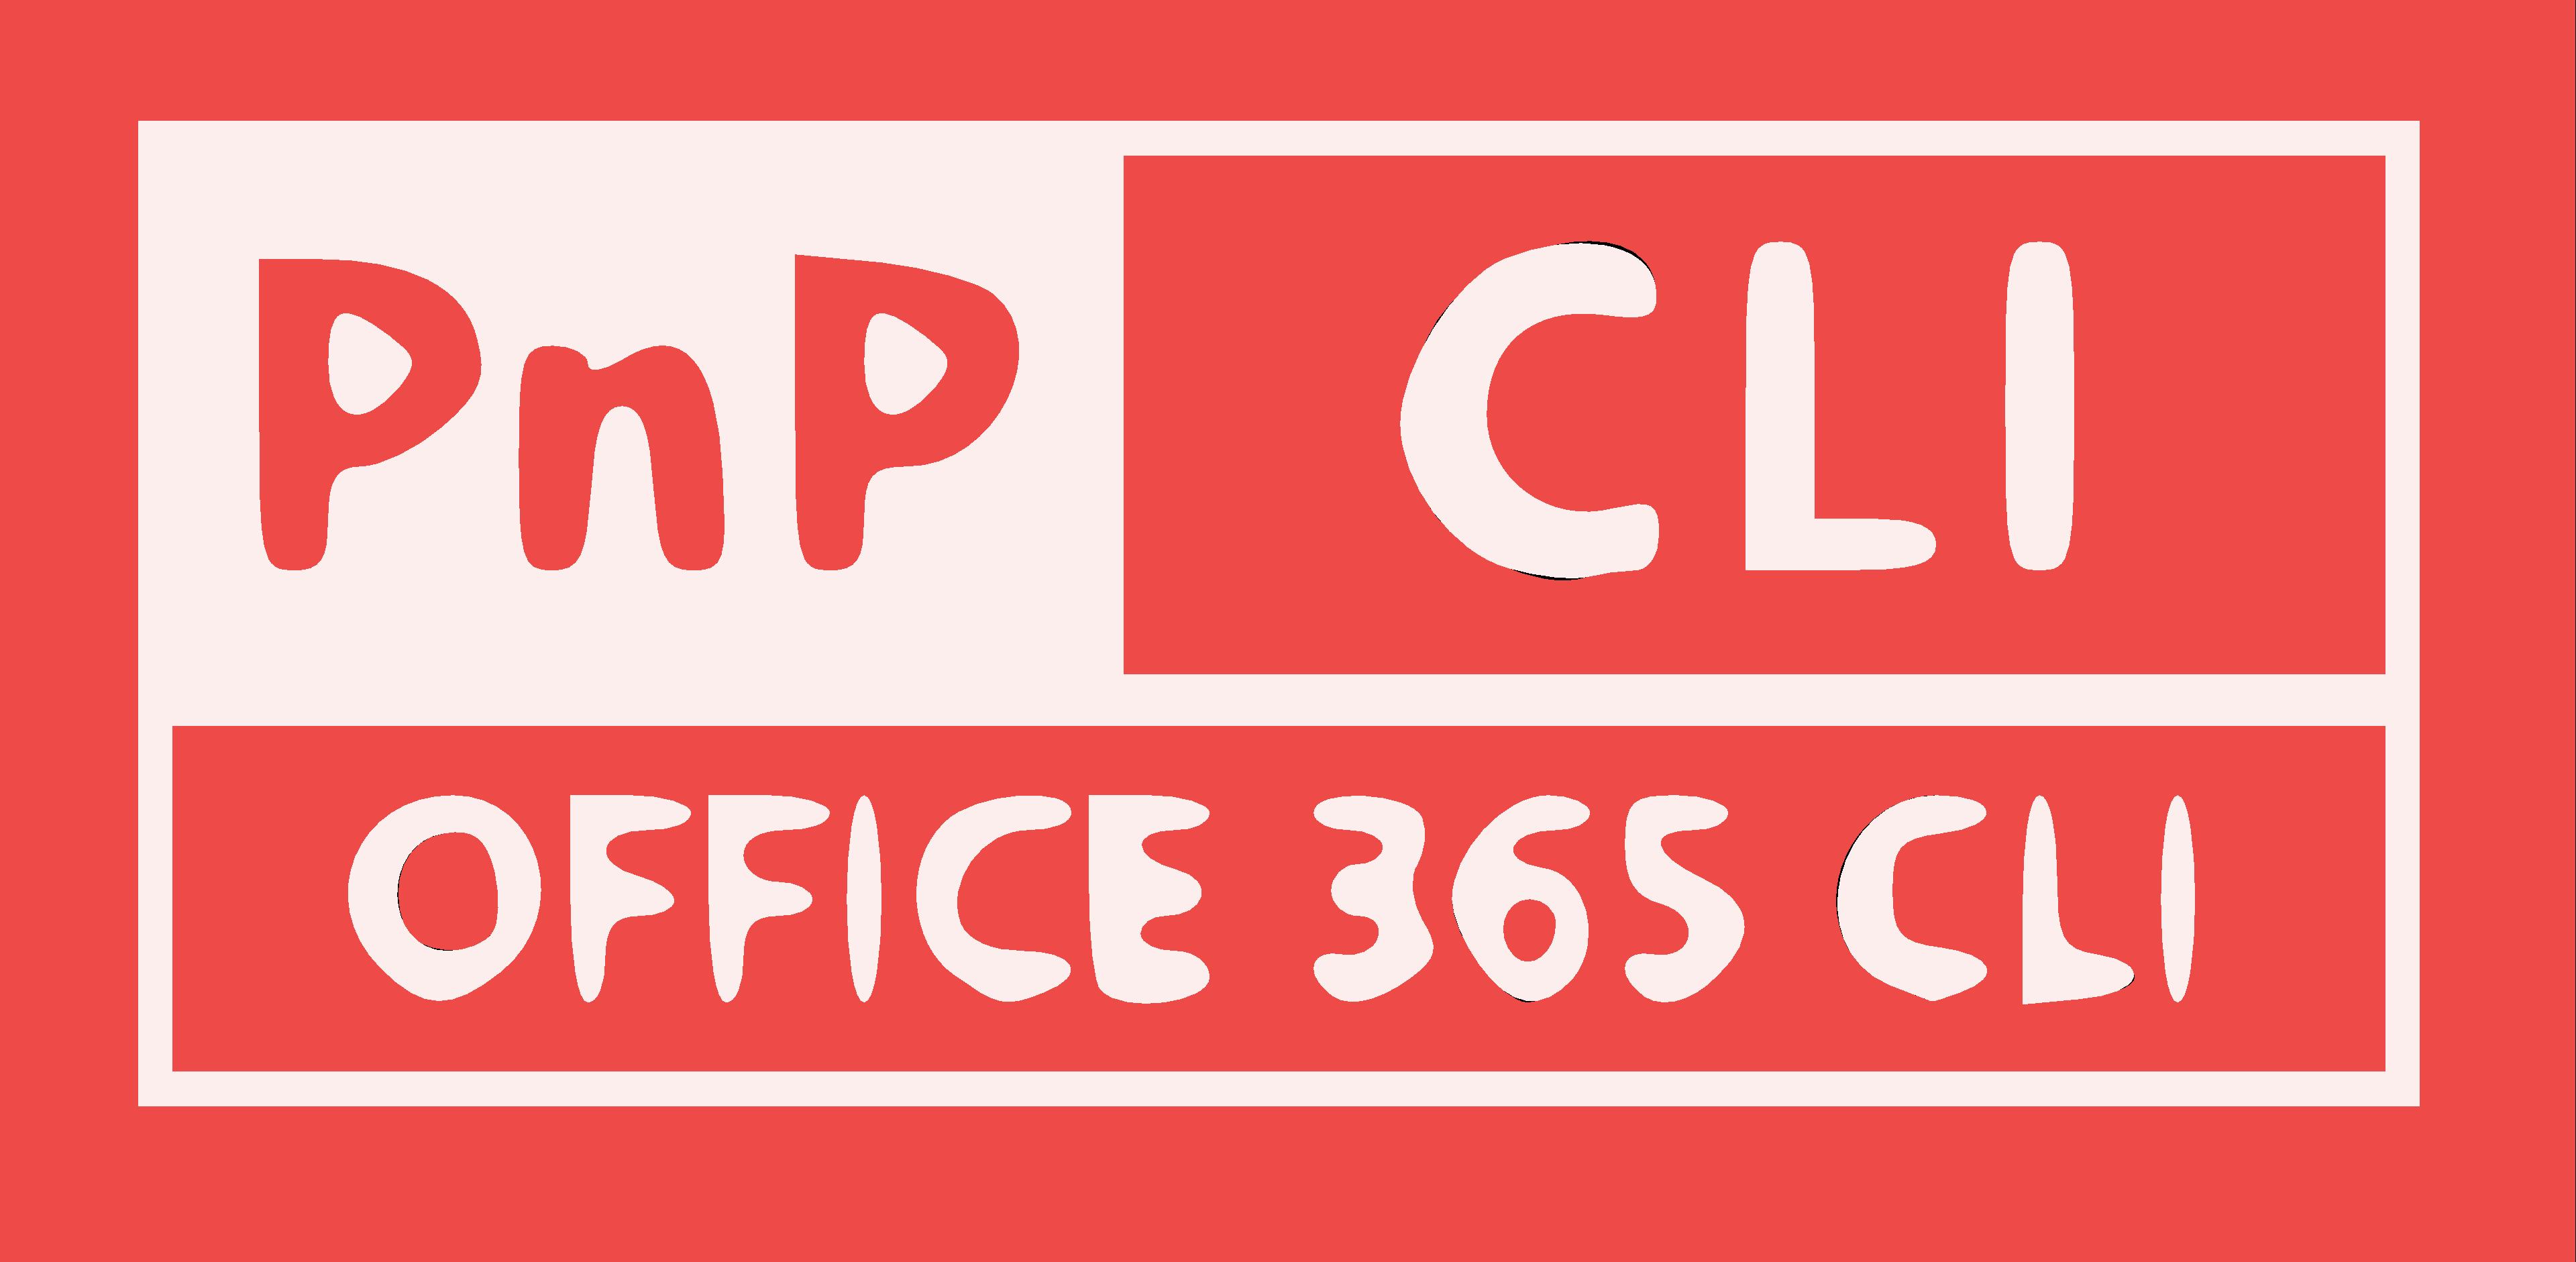 Office 365 CLI – Cross-platform Office 365 managment